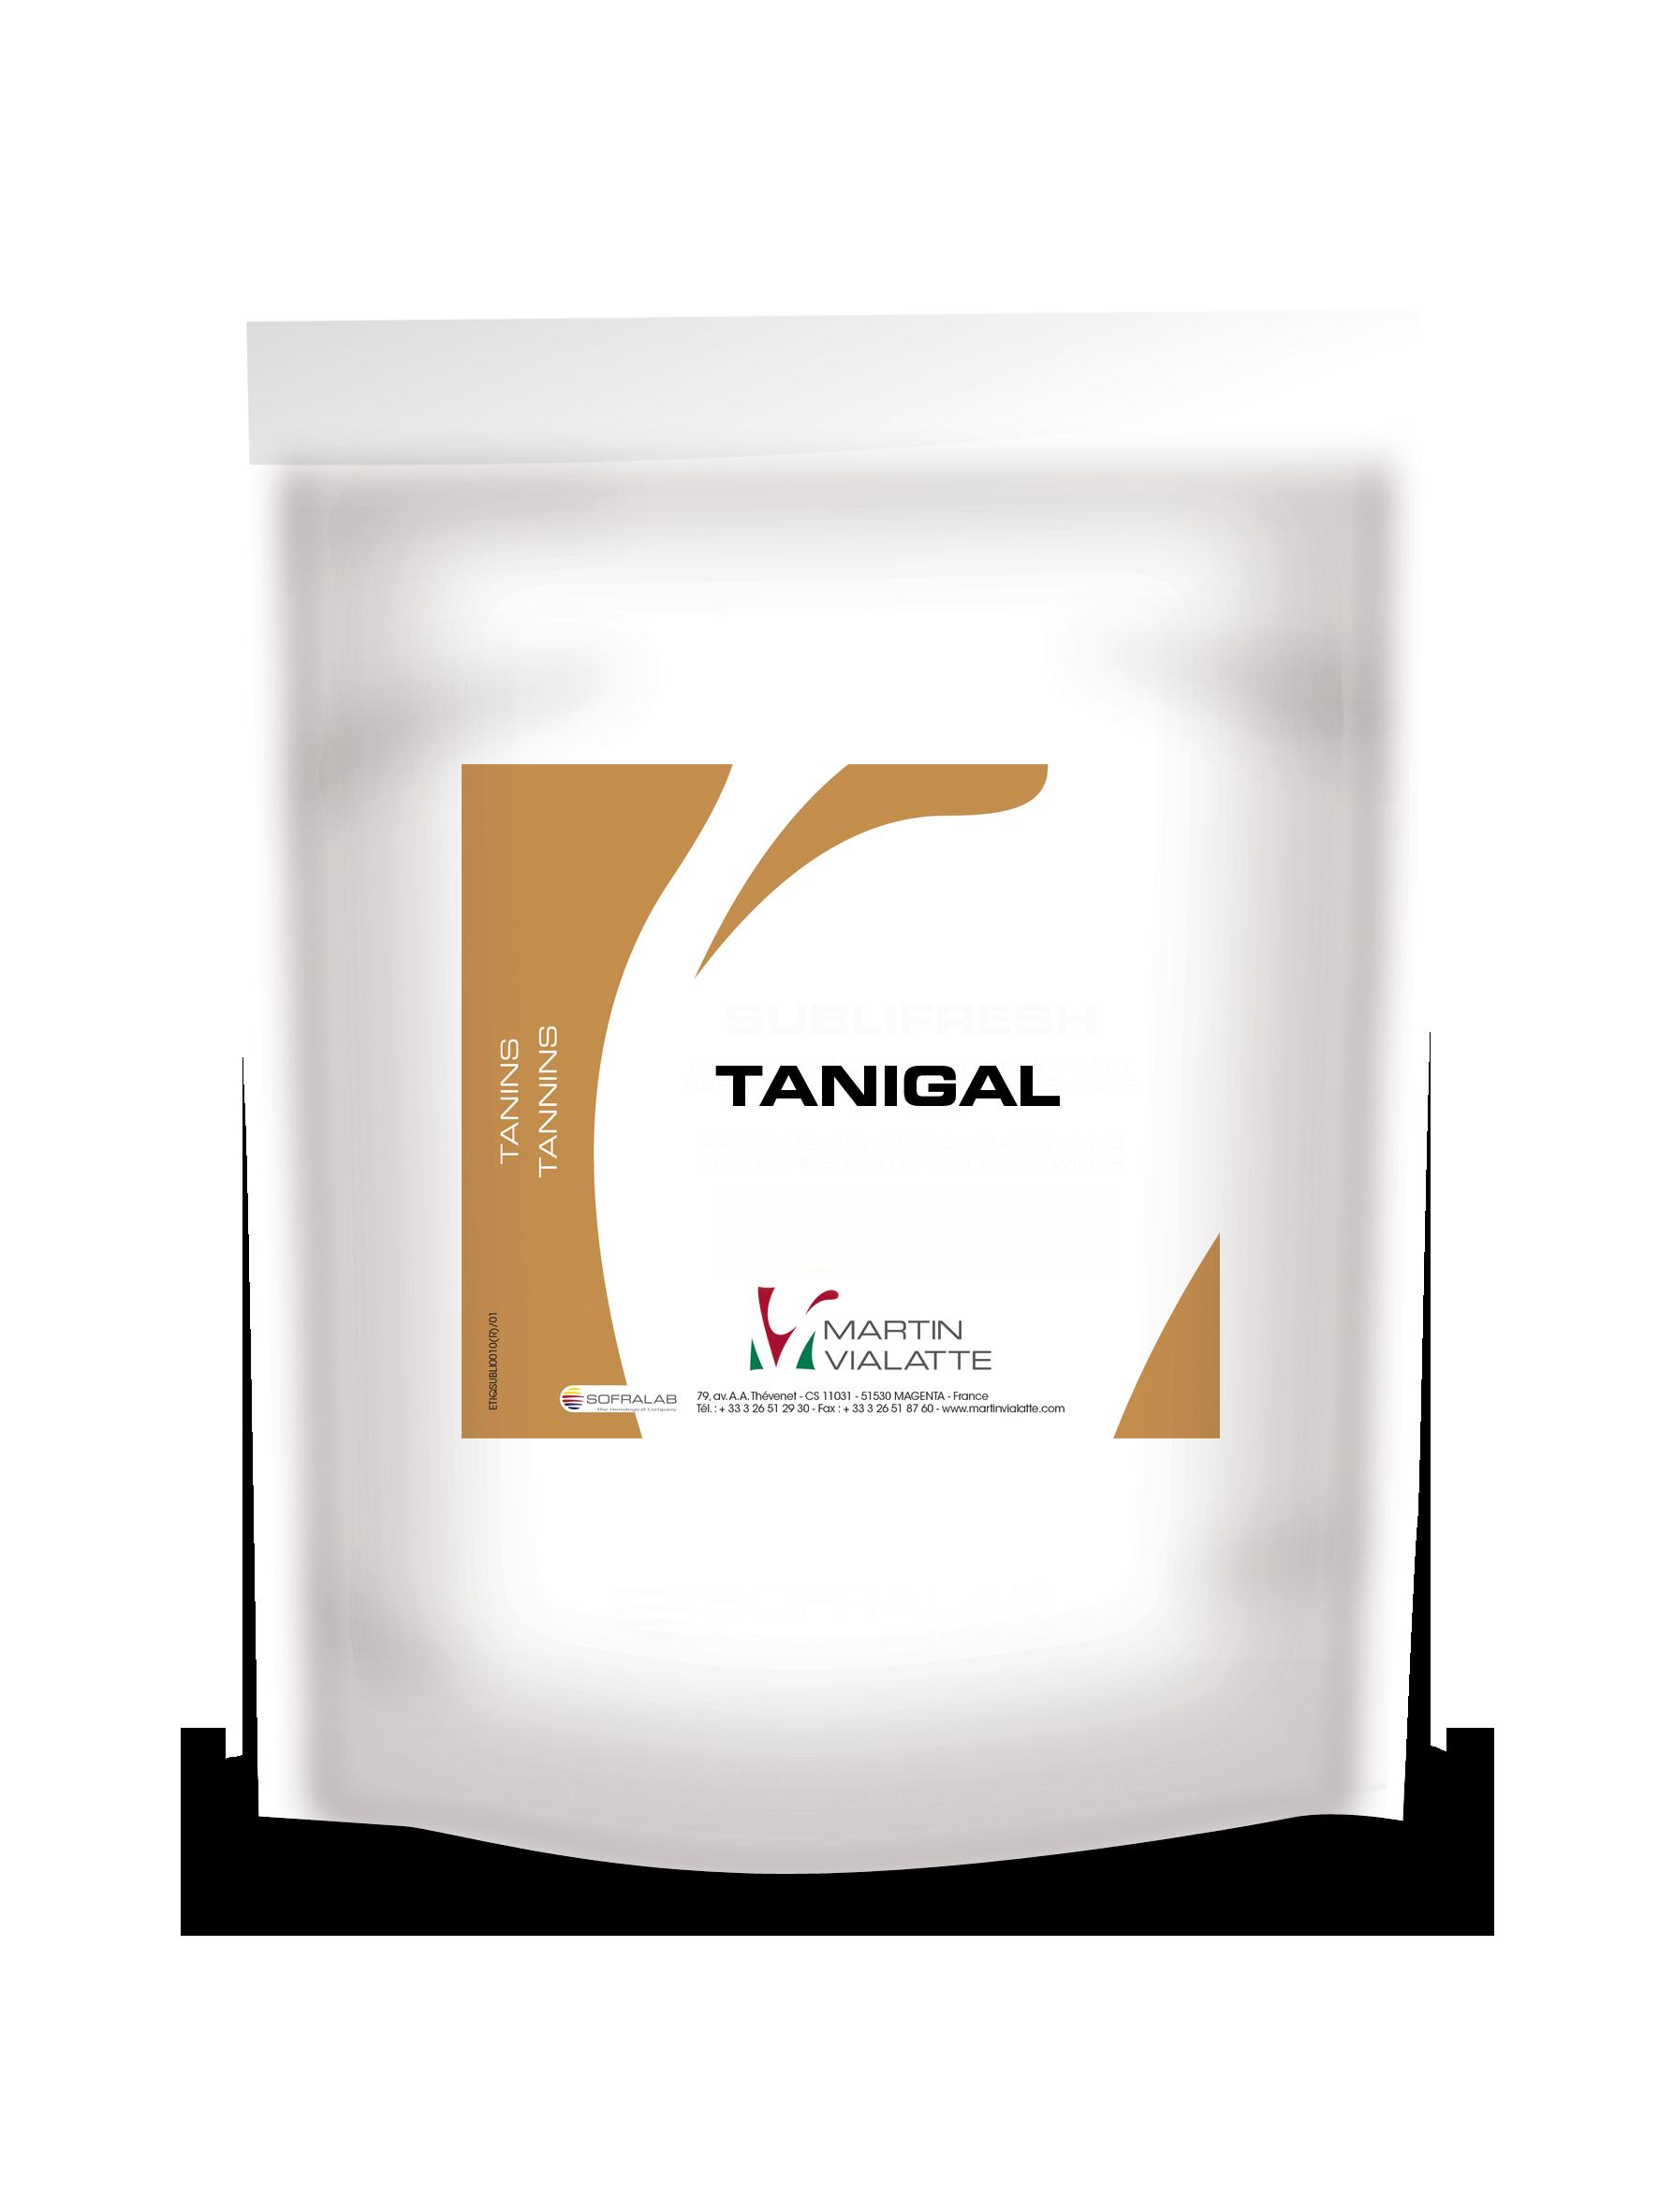 TANIGAL